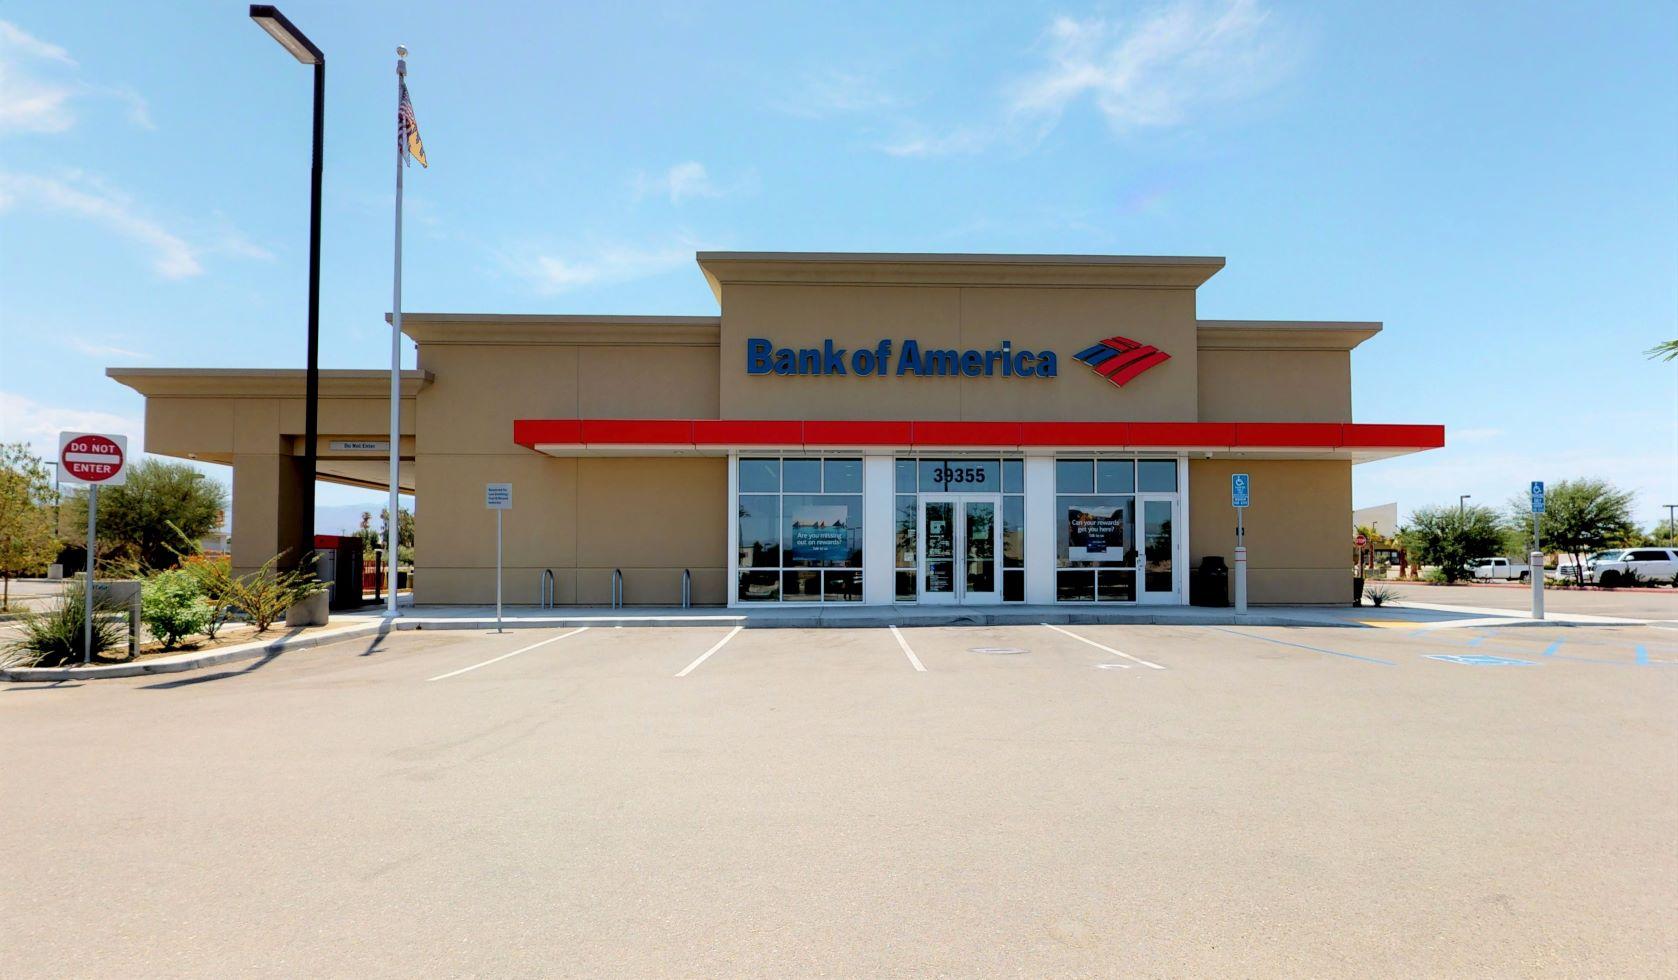 Bank of America financial center with drive-thru ATM   39355 Washington St, Palm Desert, CA 92211